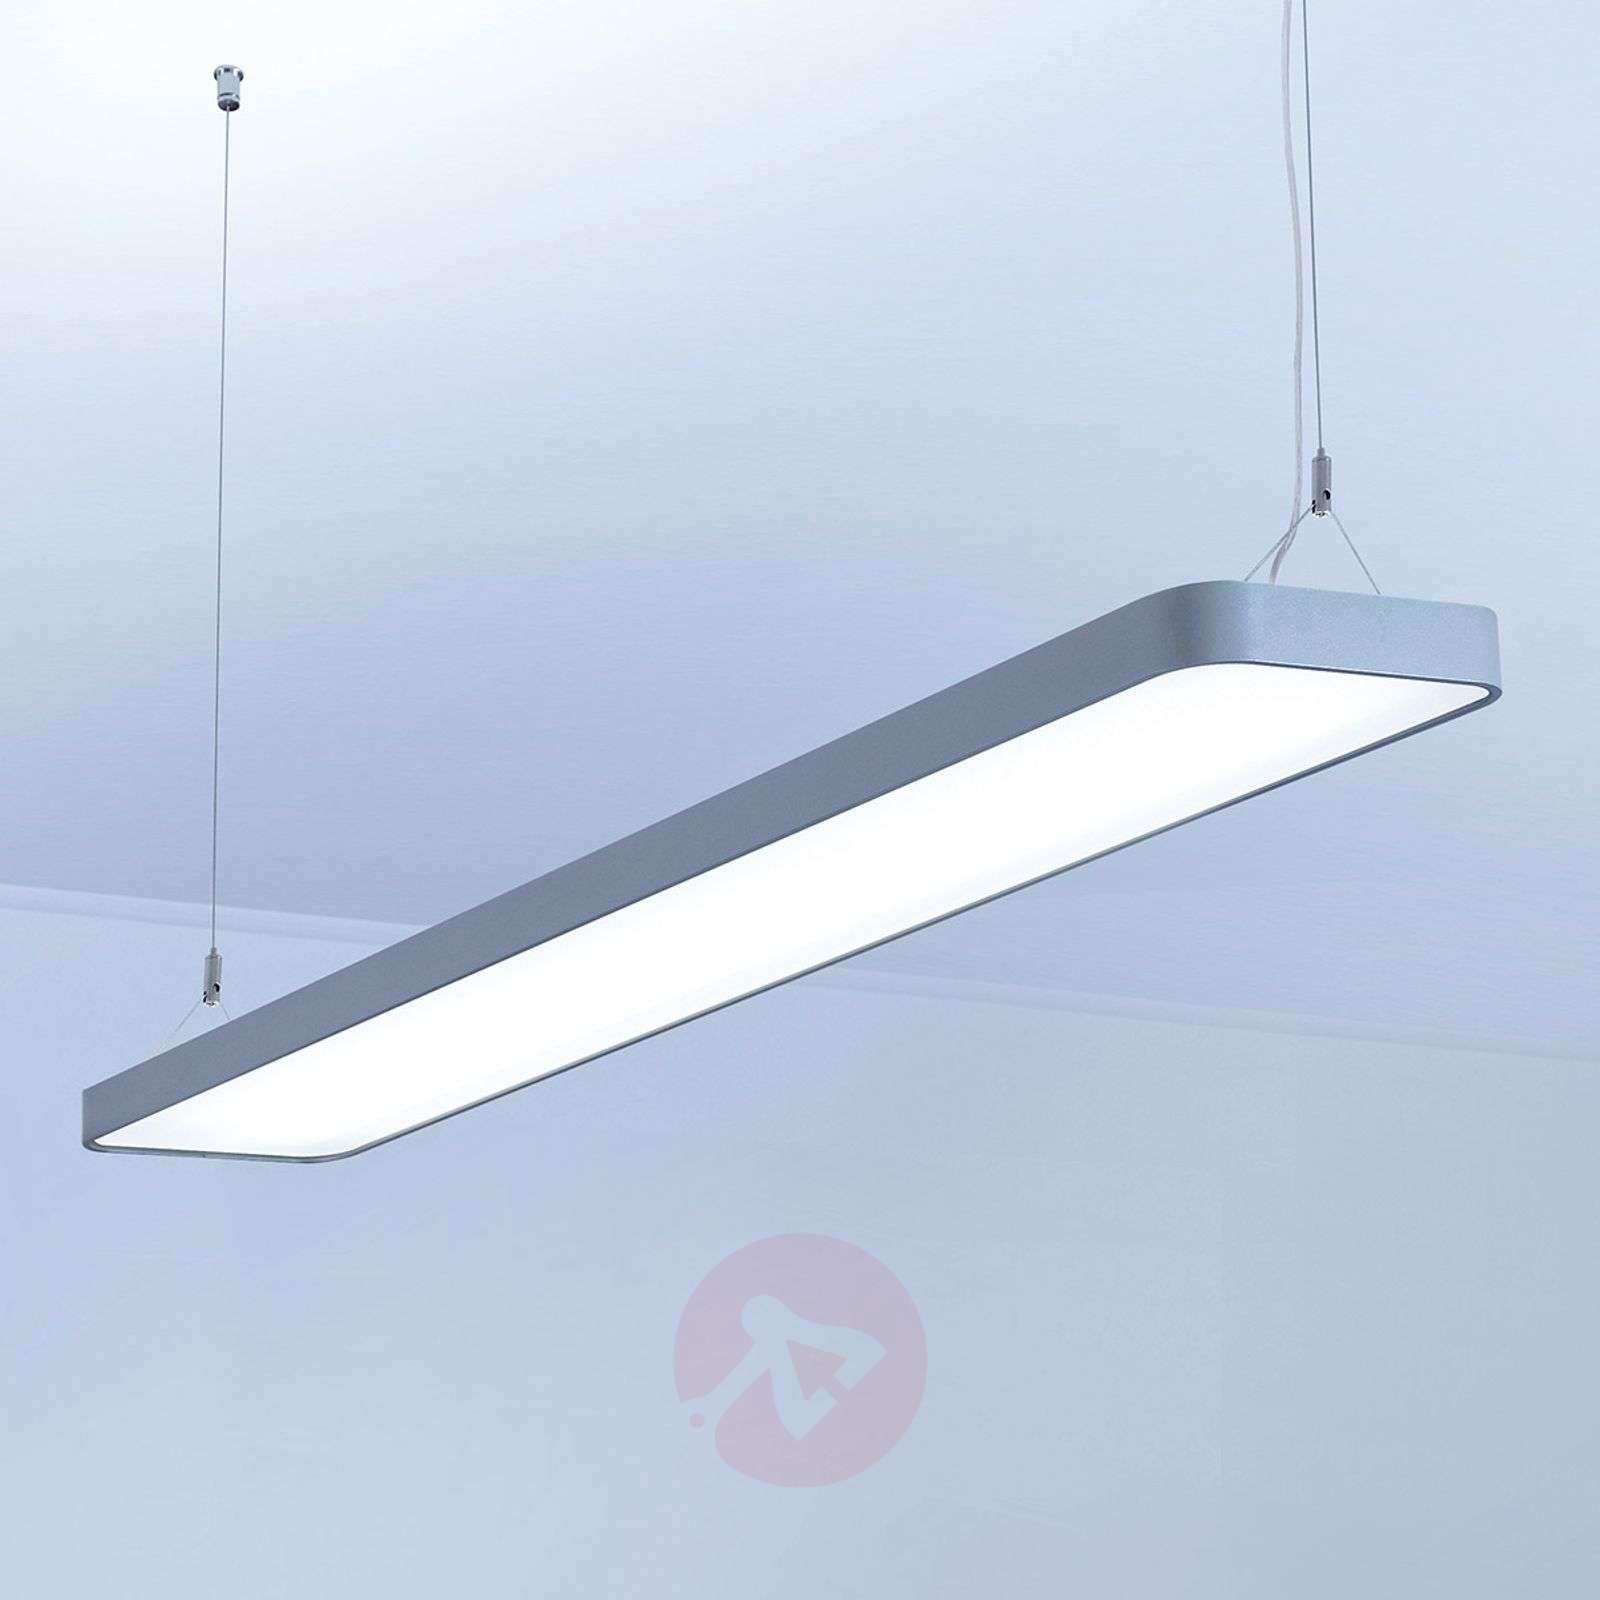 Mainio toimiston LED-riippuvalaisin Caleo-P1 73W-6033448-01